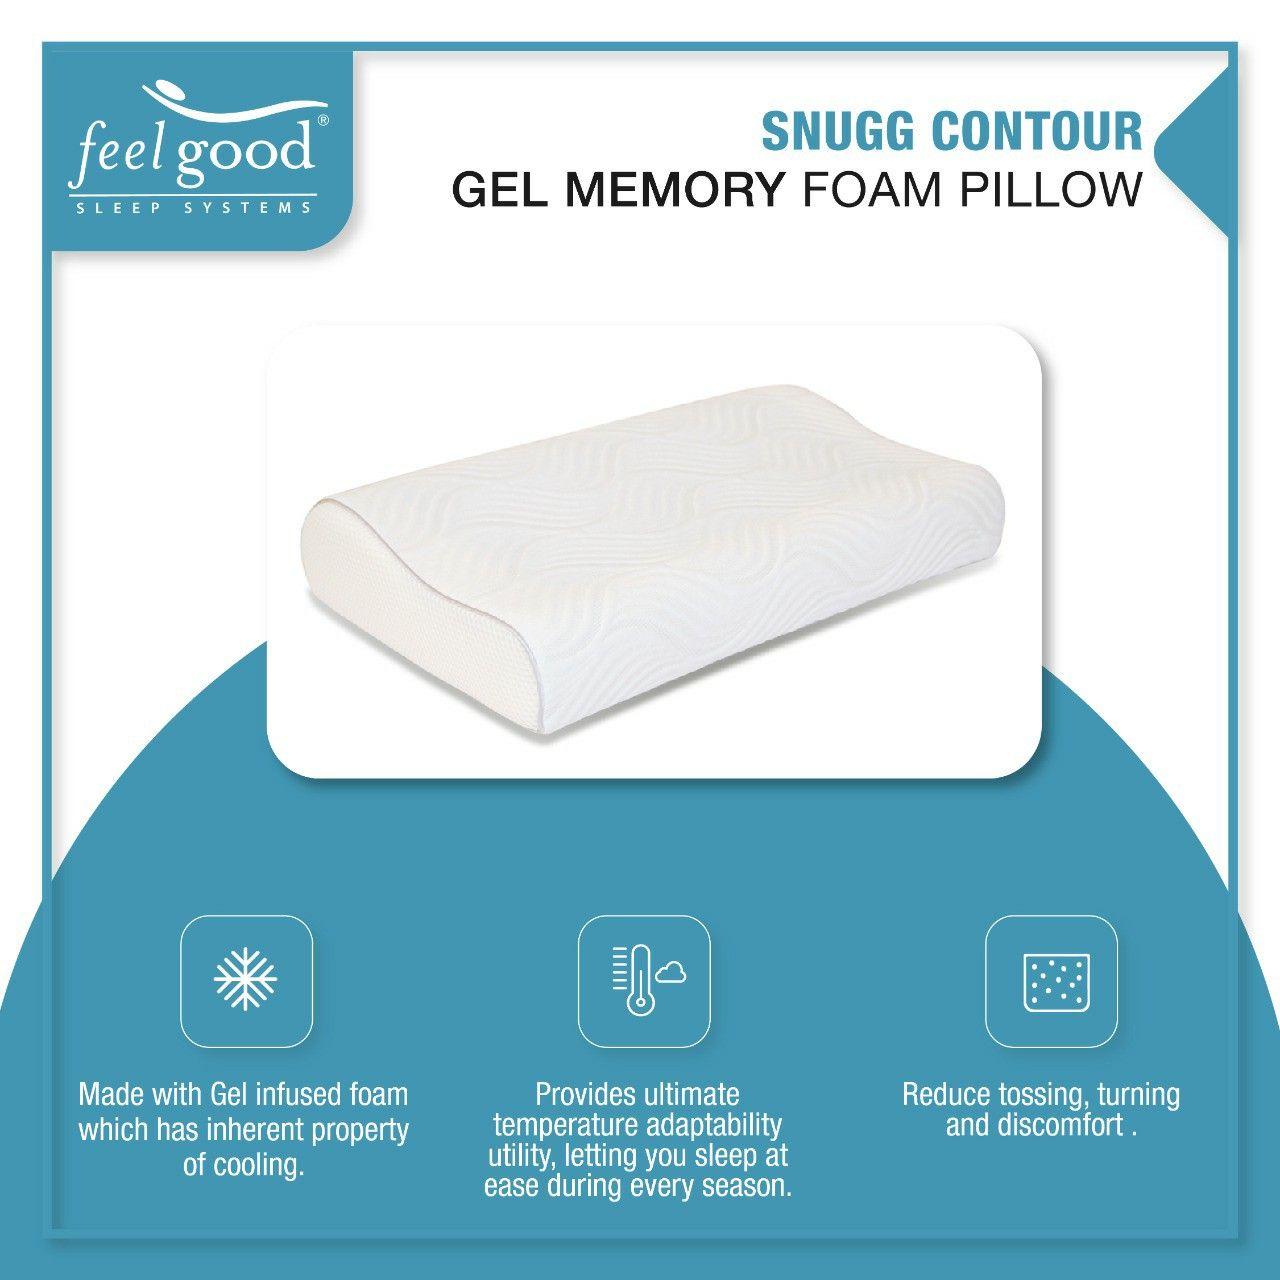 Snugg Contour Gel Infused Memory Foam Pillow In 2020 Memory Foam Pillow Foam Pillows Gel Memory Foam